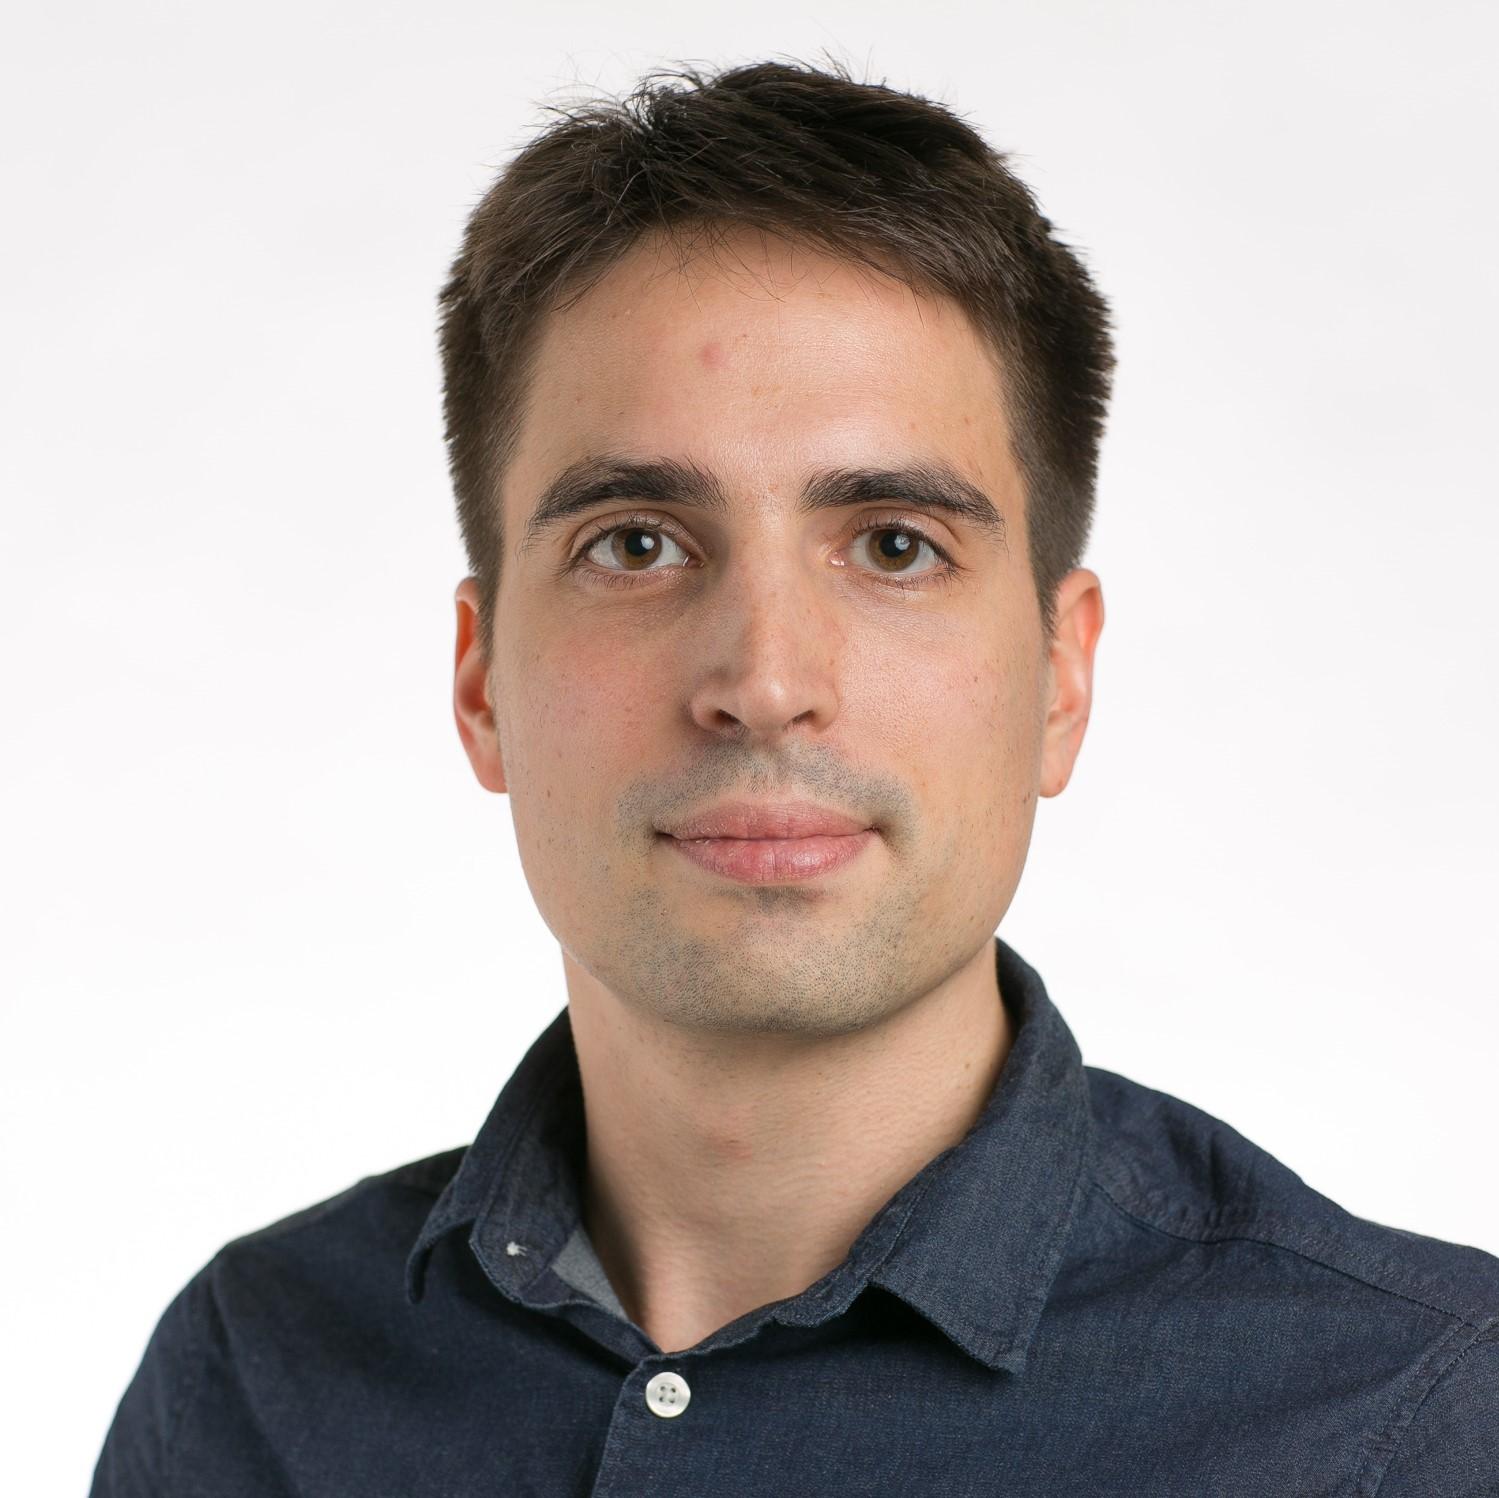 Simon Schölly